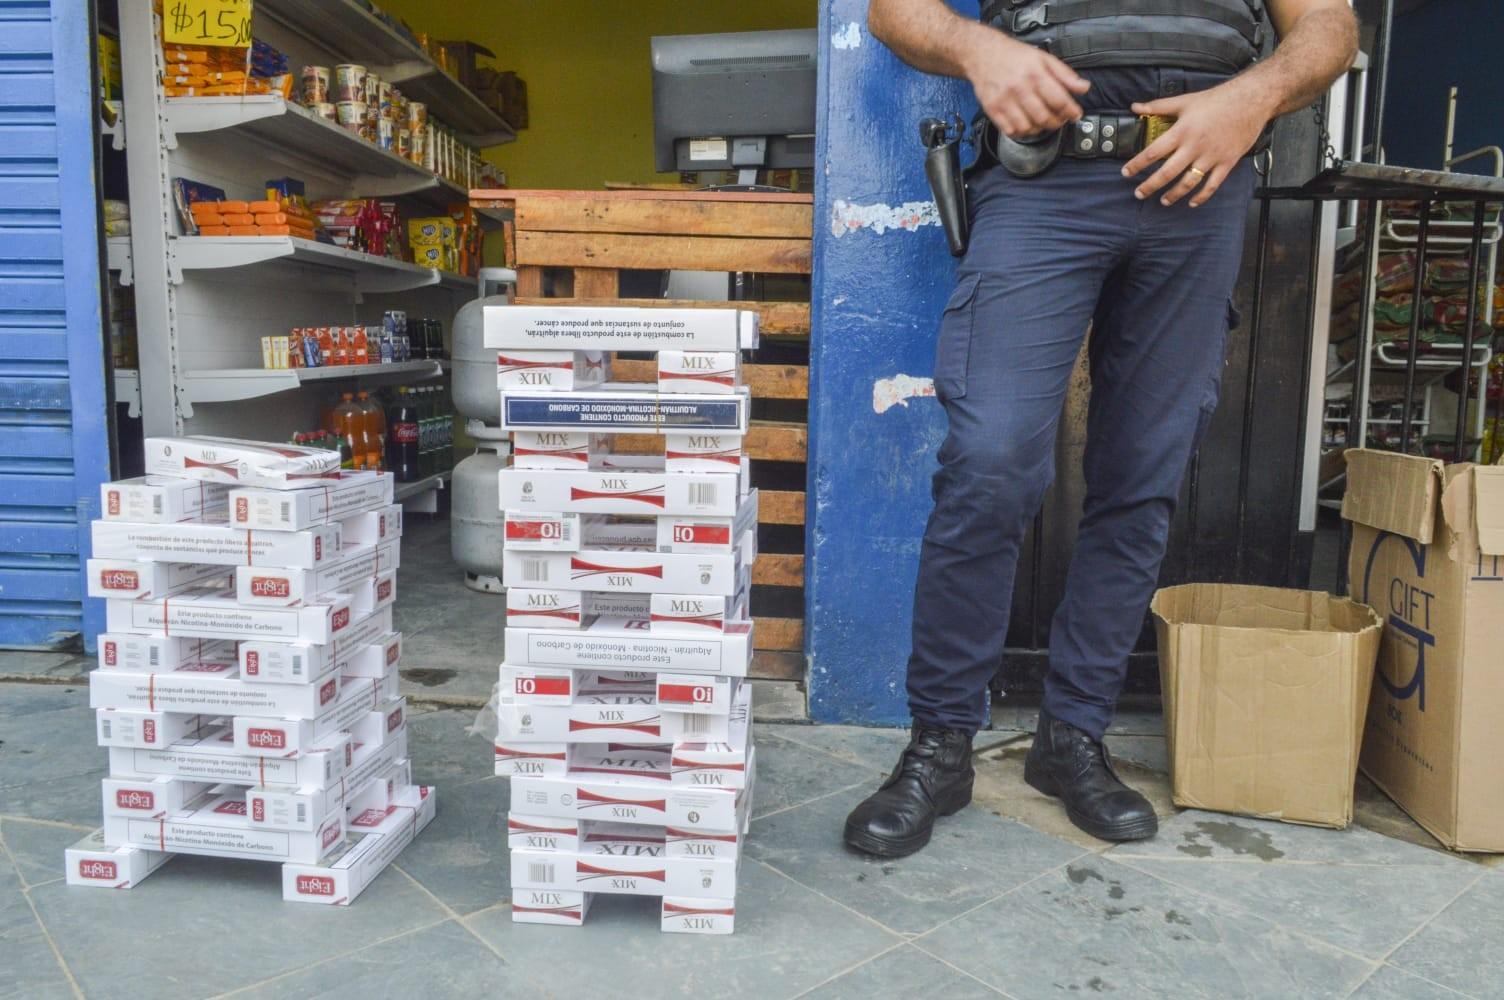 Guarda Municipal apreende 550 maços de cigarro falsificados em adega de Itaquaquecetuba